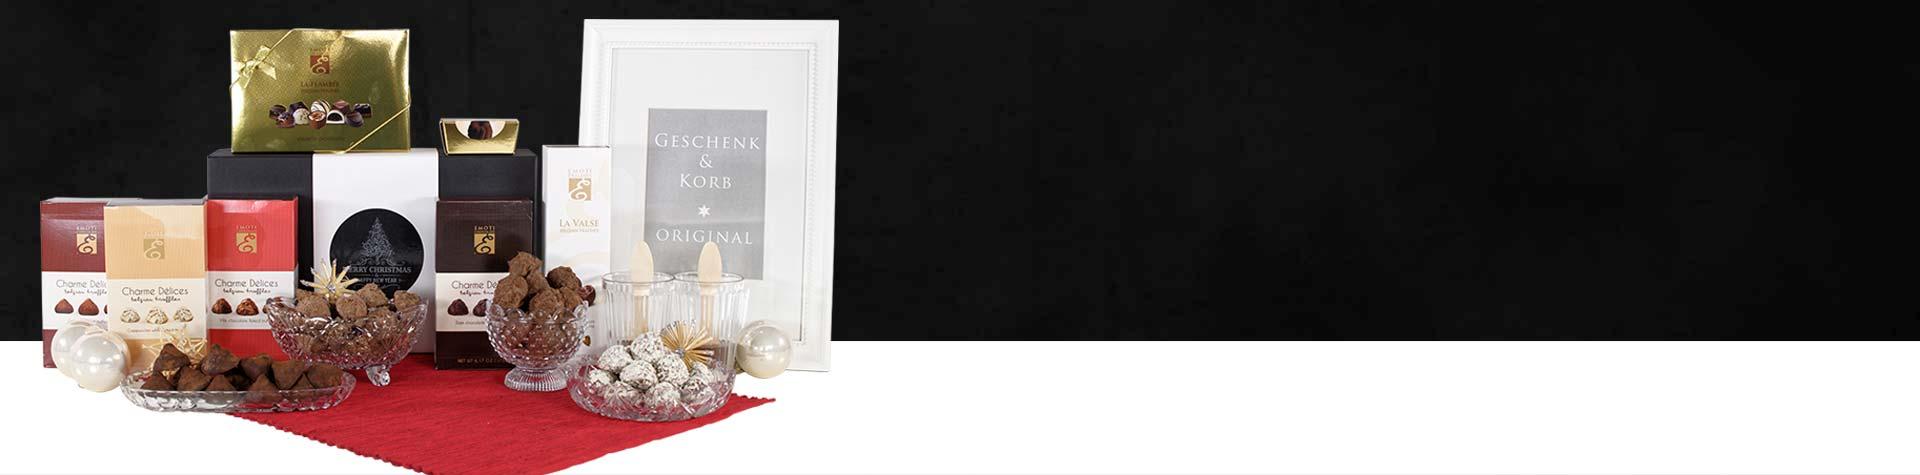 Geschenkkorb | + 250 Geschenkkörbe online verschicken lassen